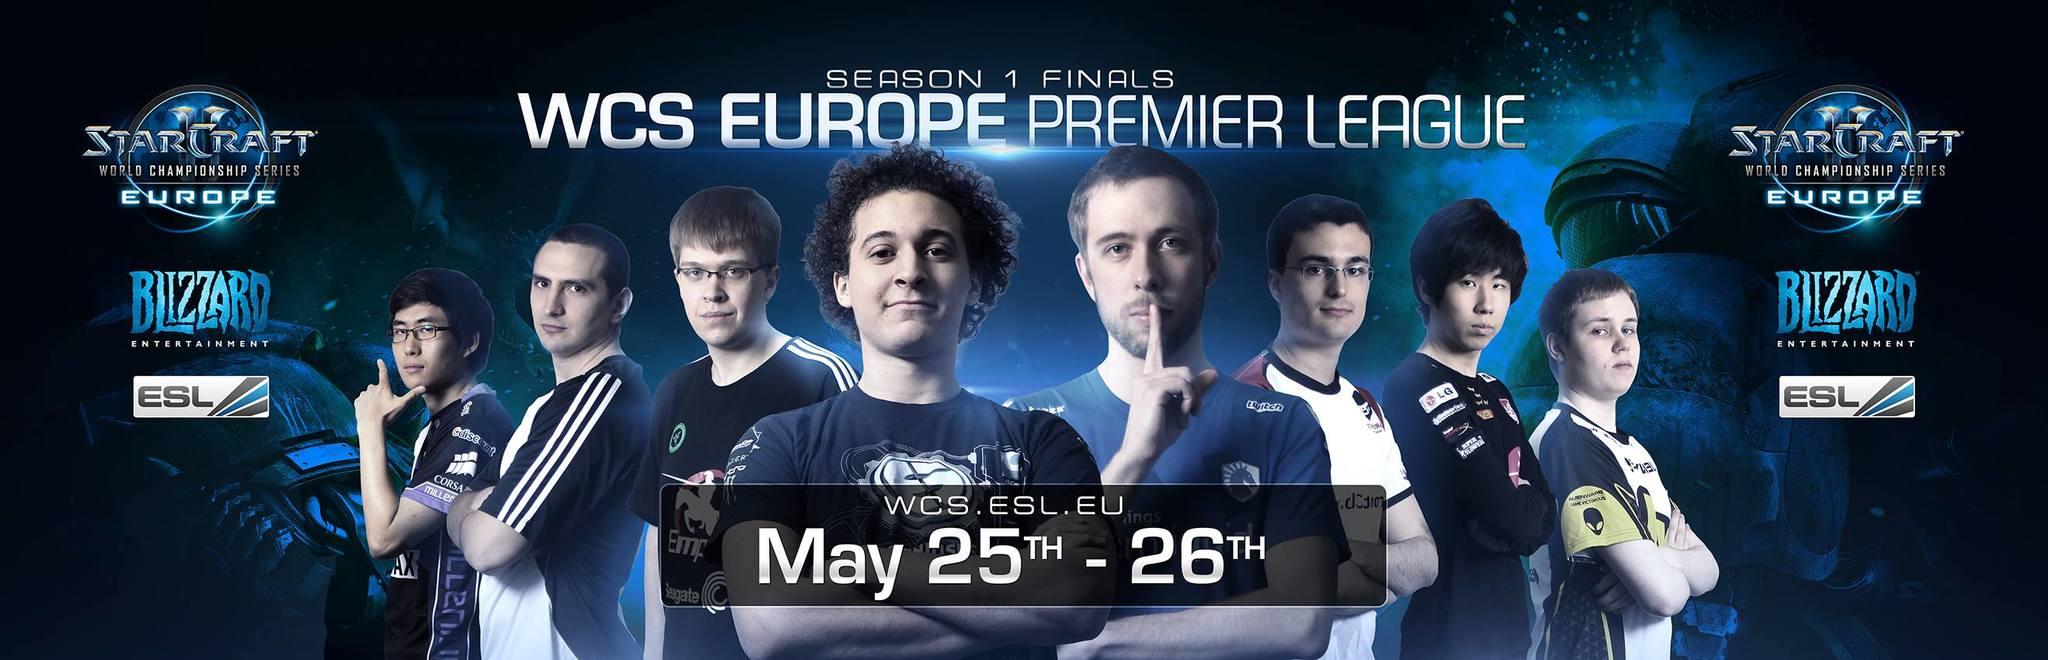 2012WCS_EU_Finals.jpg